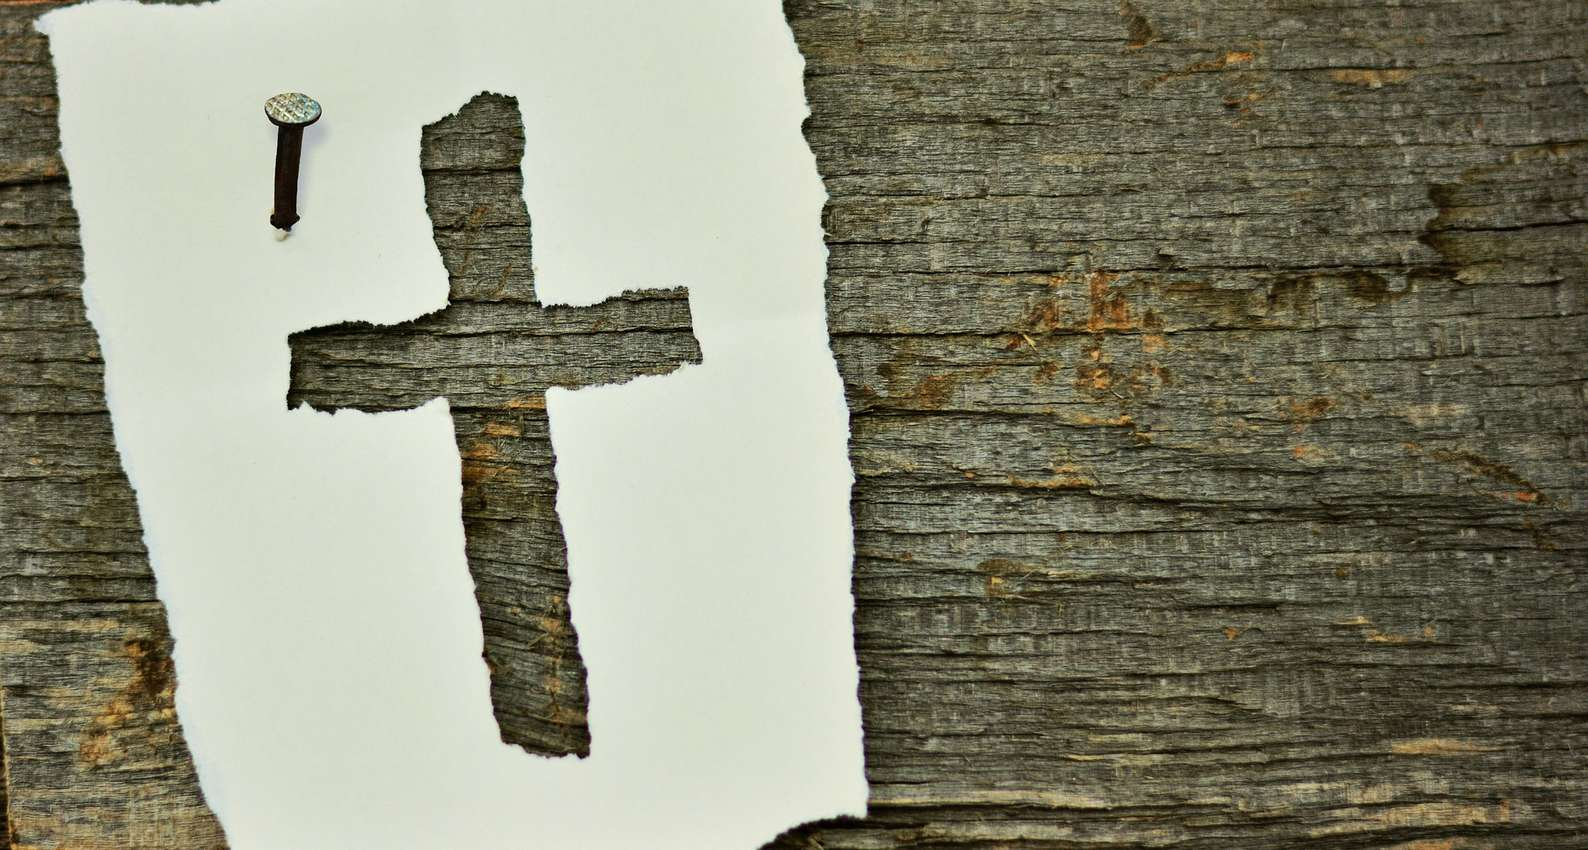 Power through meekness